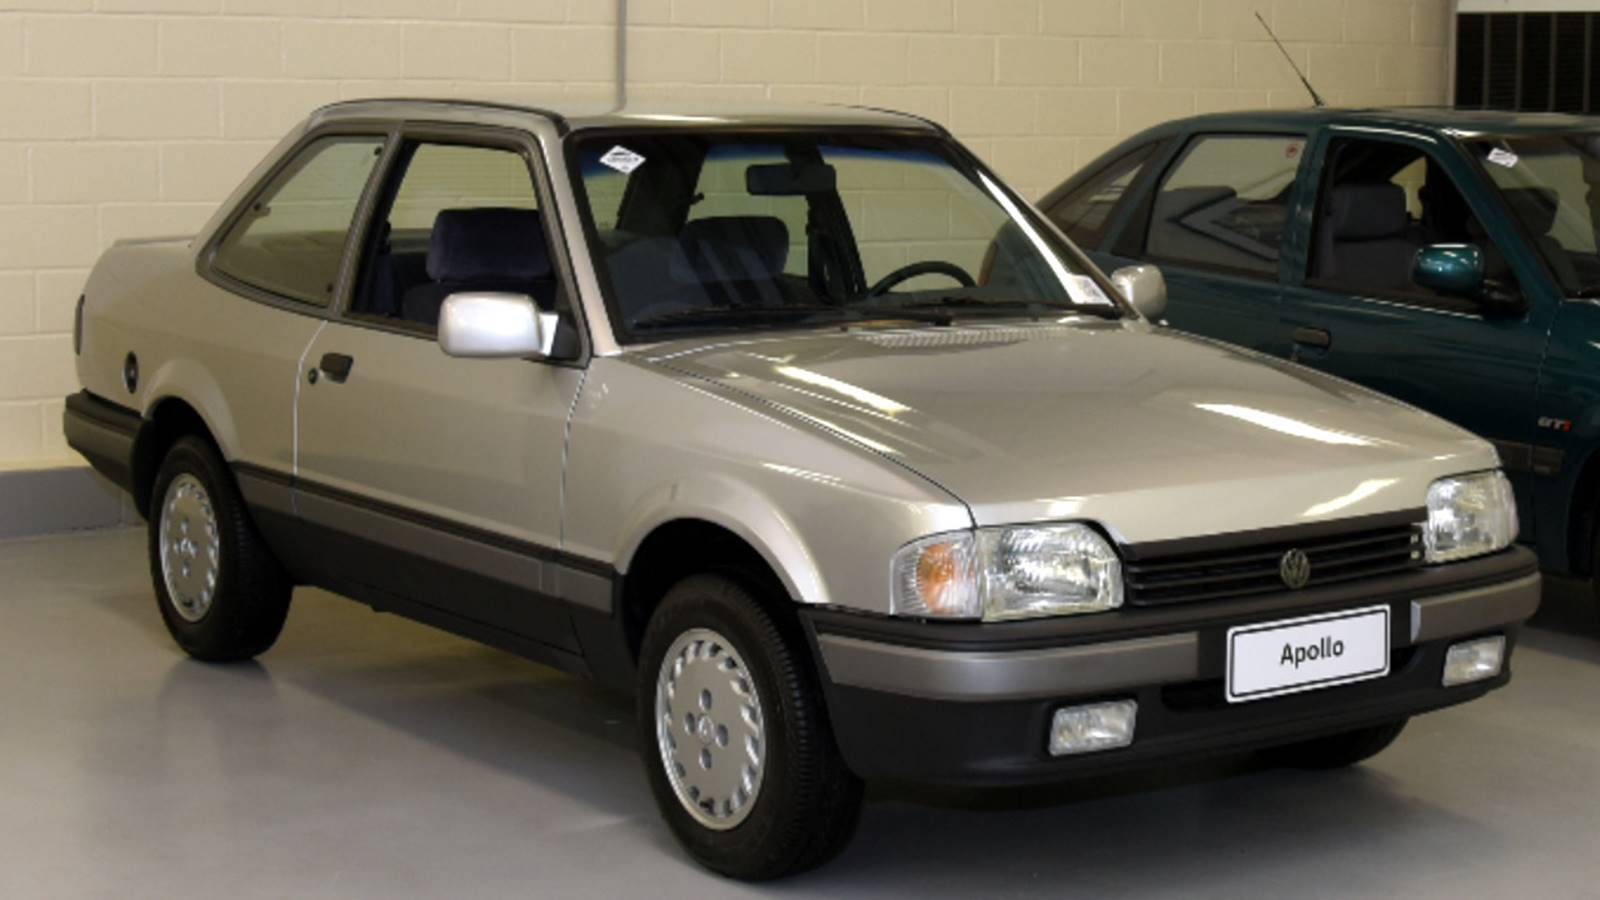 Apollo foi fruto de uma plataforma Autolatina que serviu a diferentes modelos Volkswagen e Ford